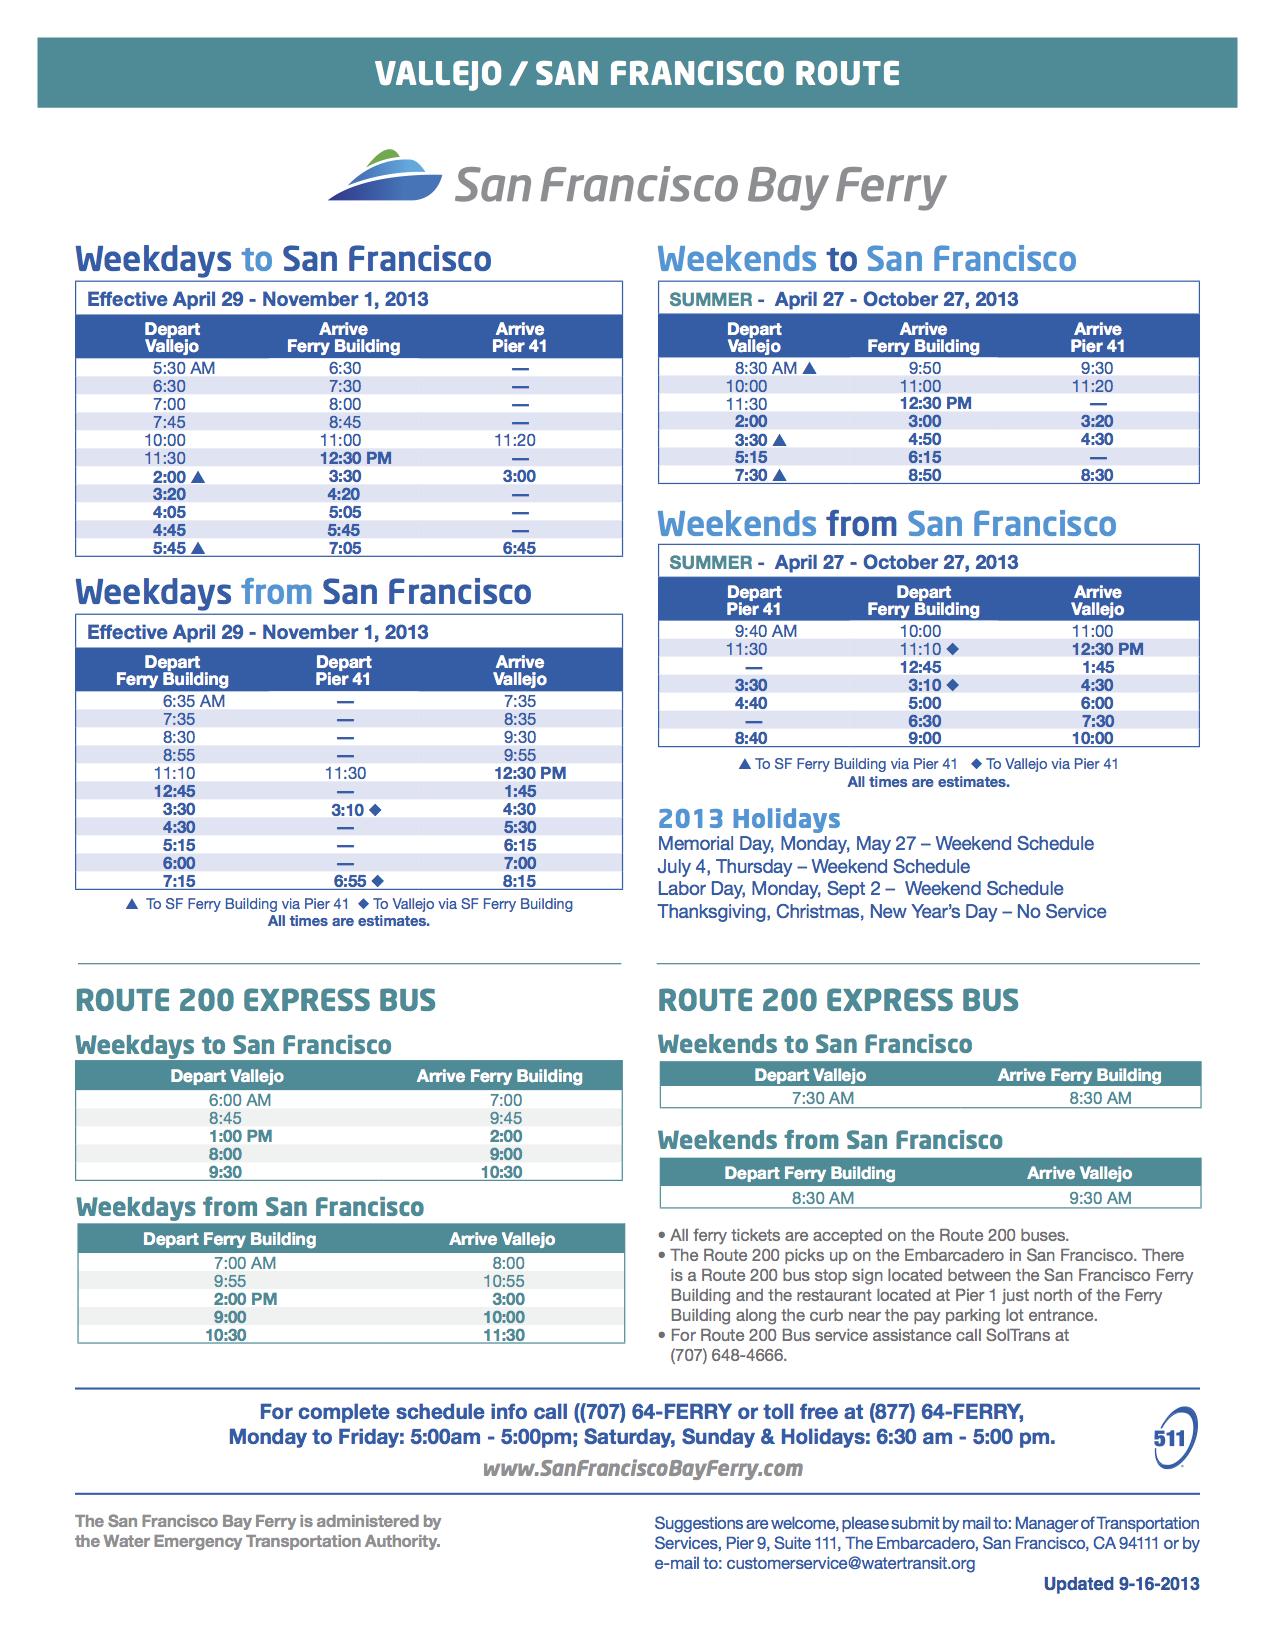 vallejo-to-san-francisco-ferry-schedule - vallejo bay ferry